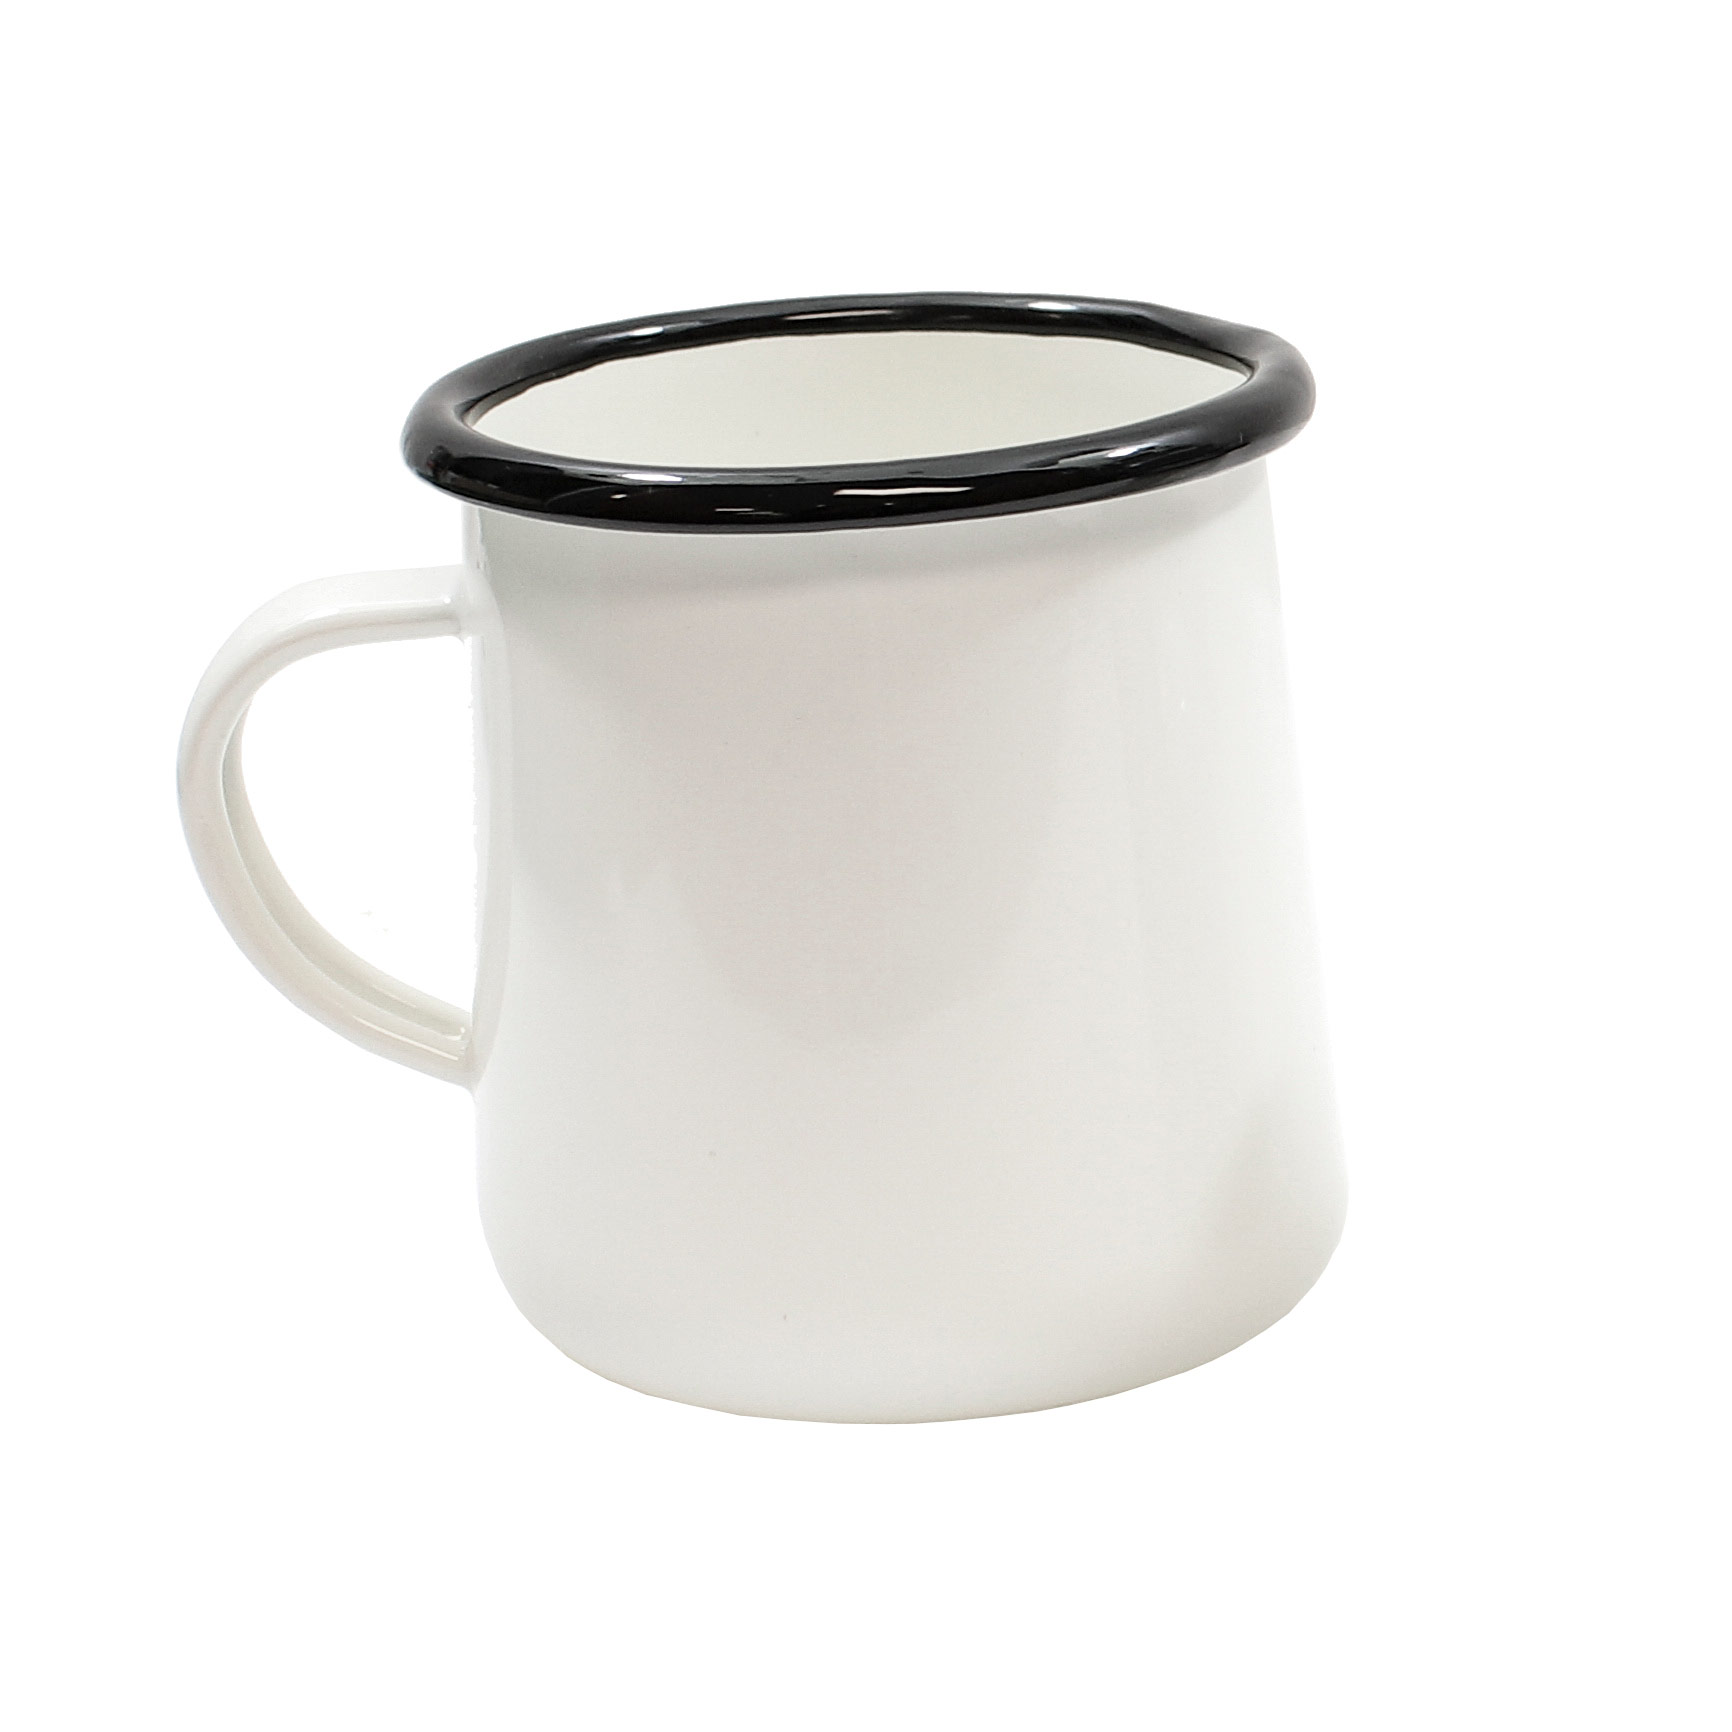 TableCraft Products 80008 mug, metal